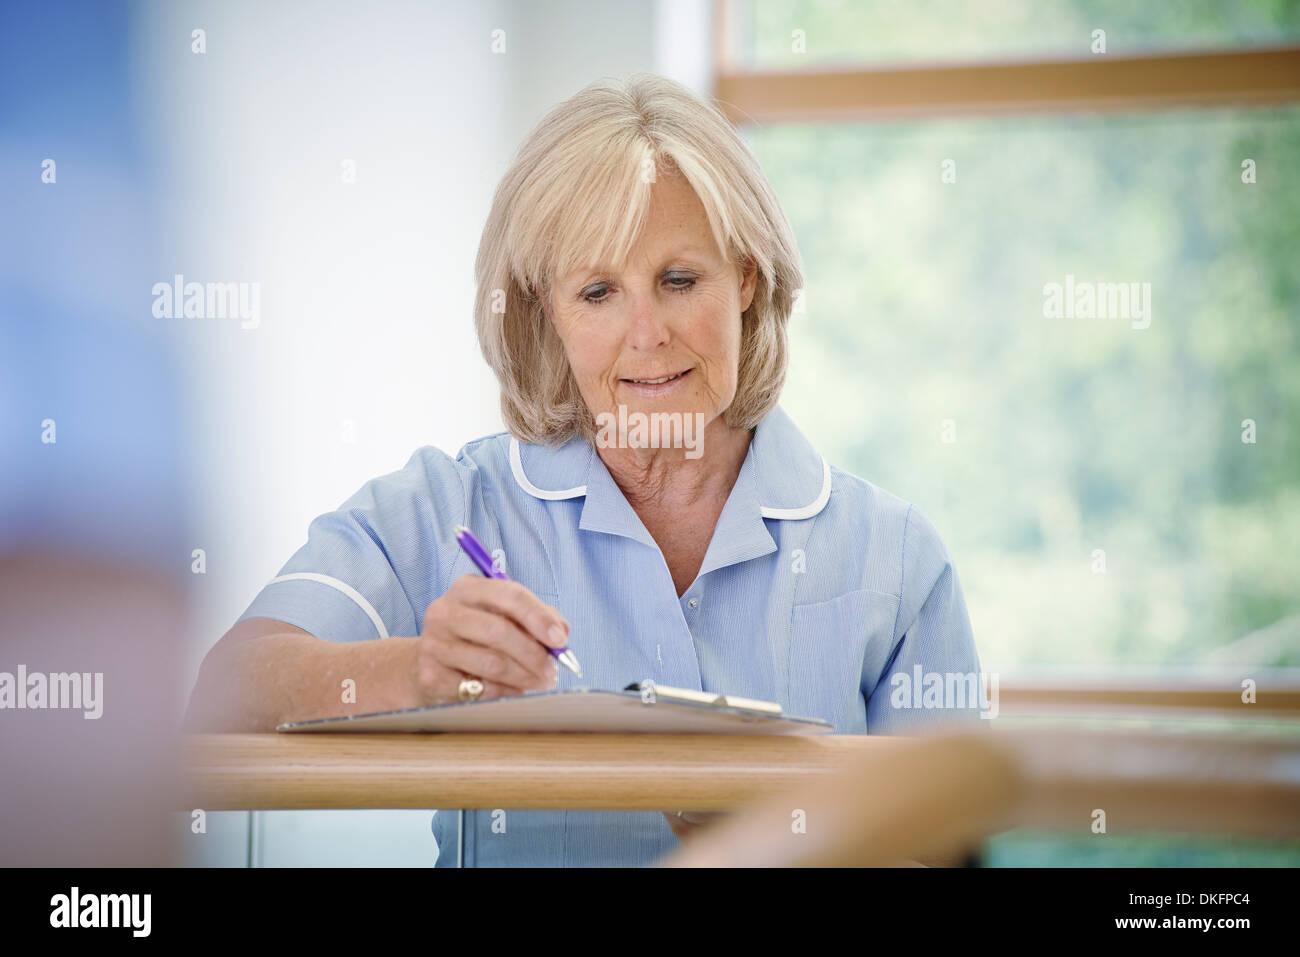 Mature female nurse in hospital corridor with clipboard - Stock Image